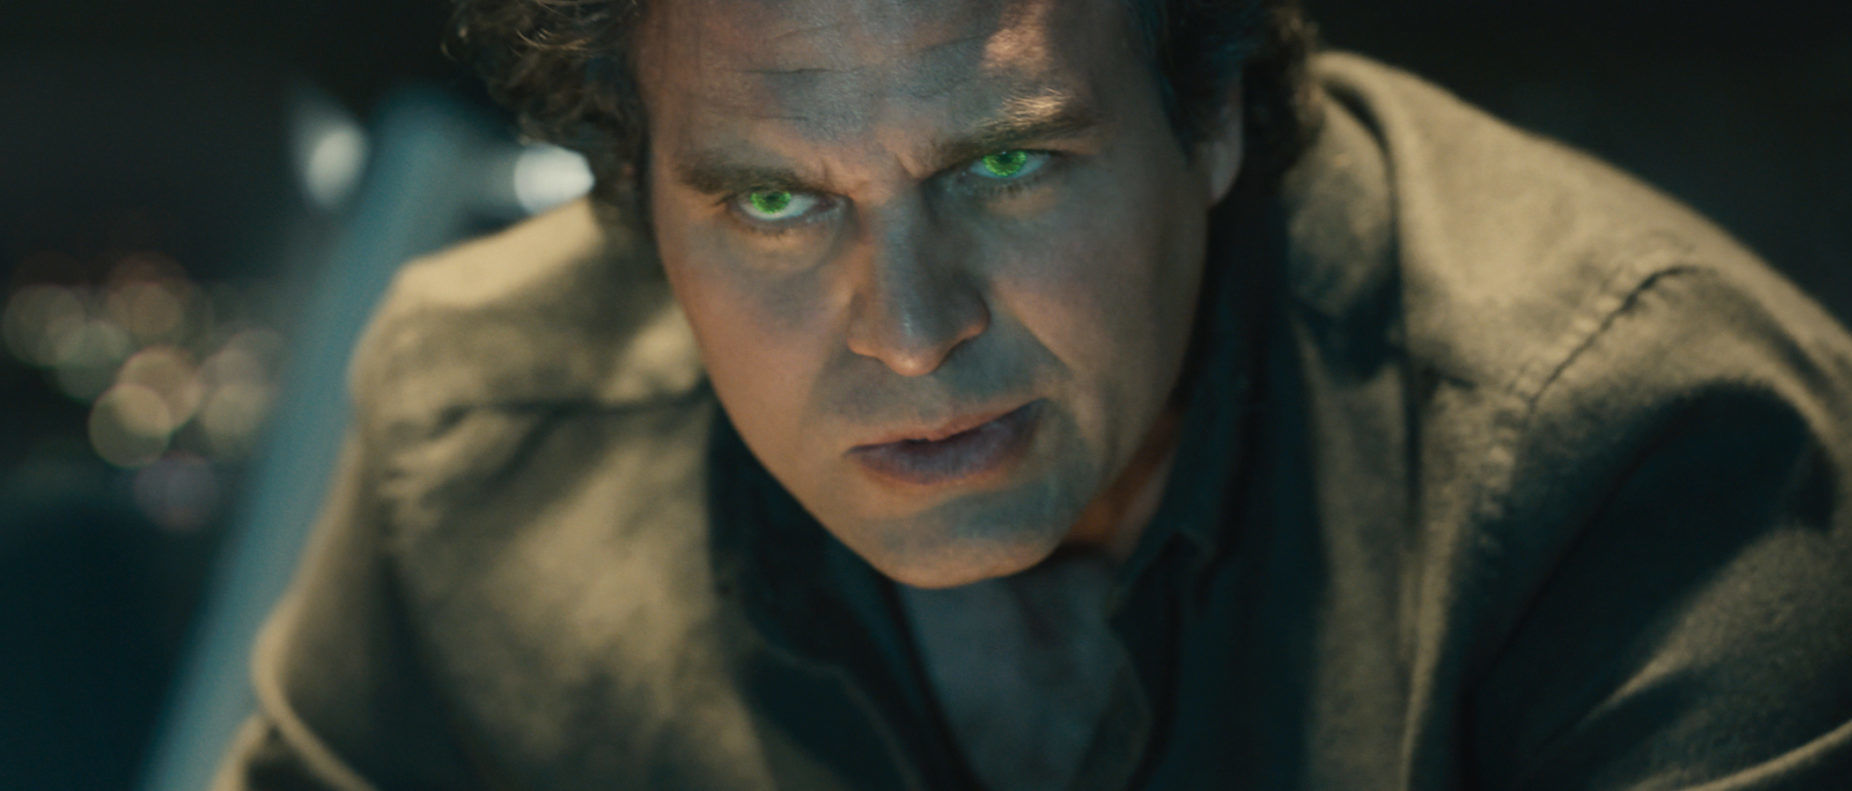 the-avengers-age-of-ultron mark ruffalo netflix movie ryan reynolds